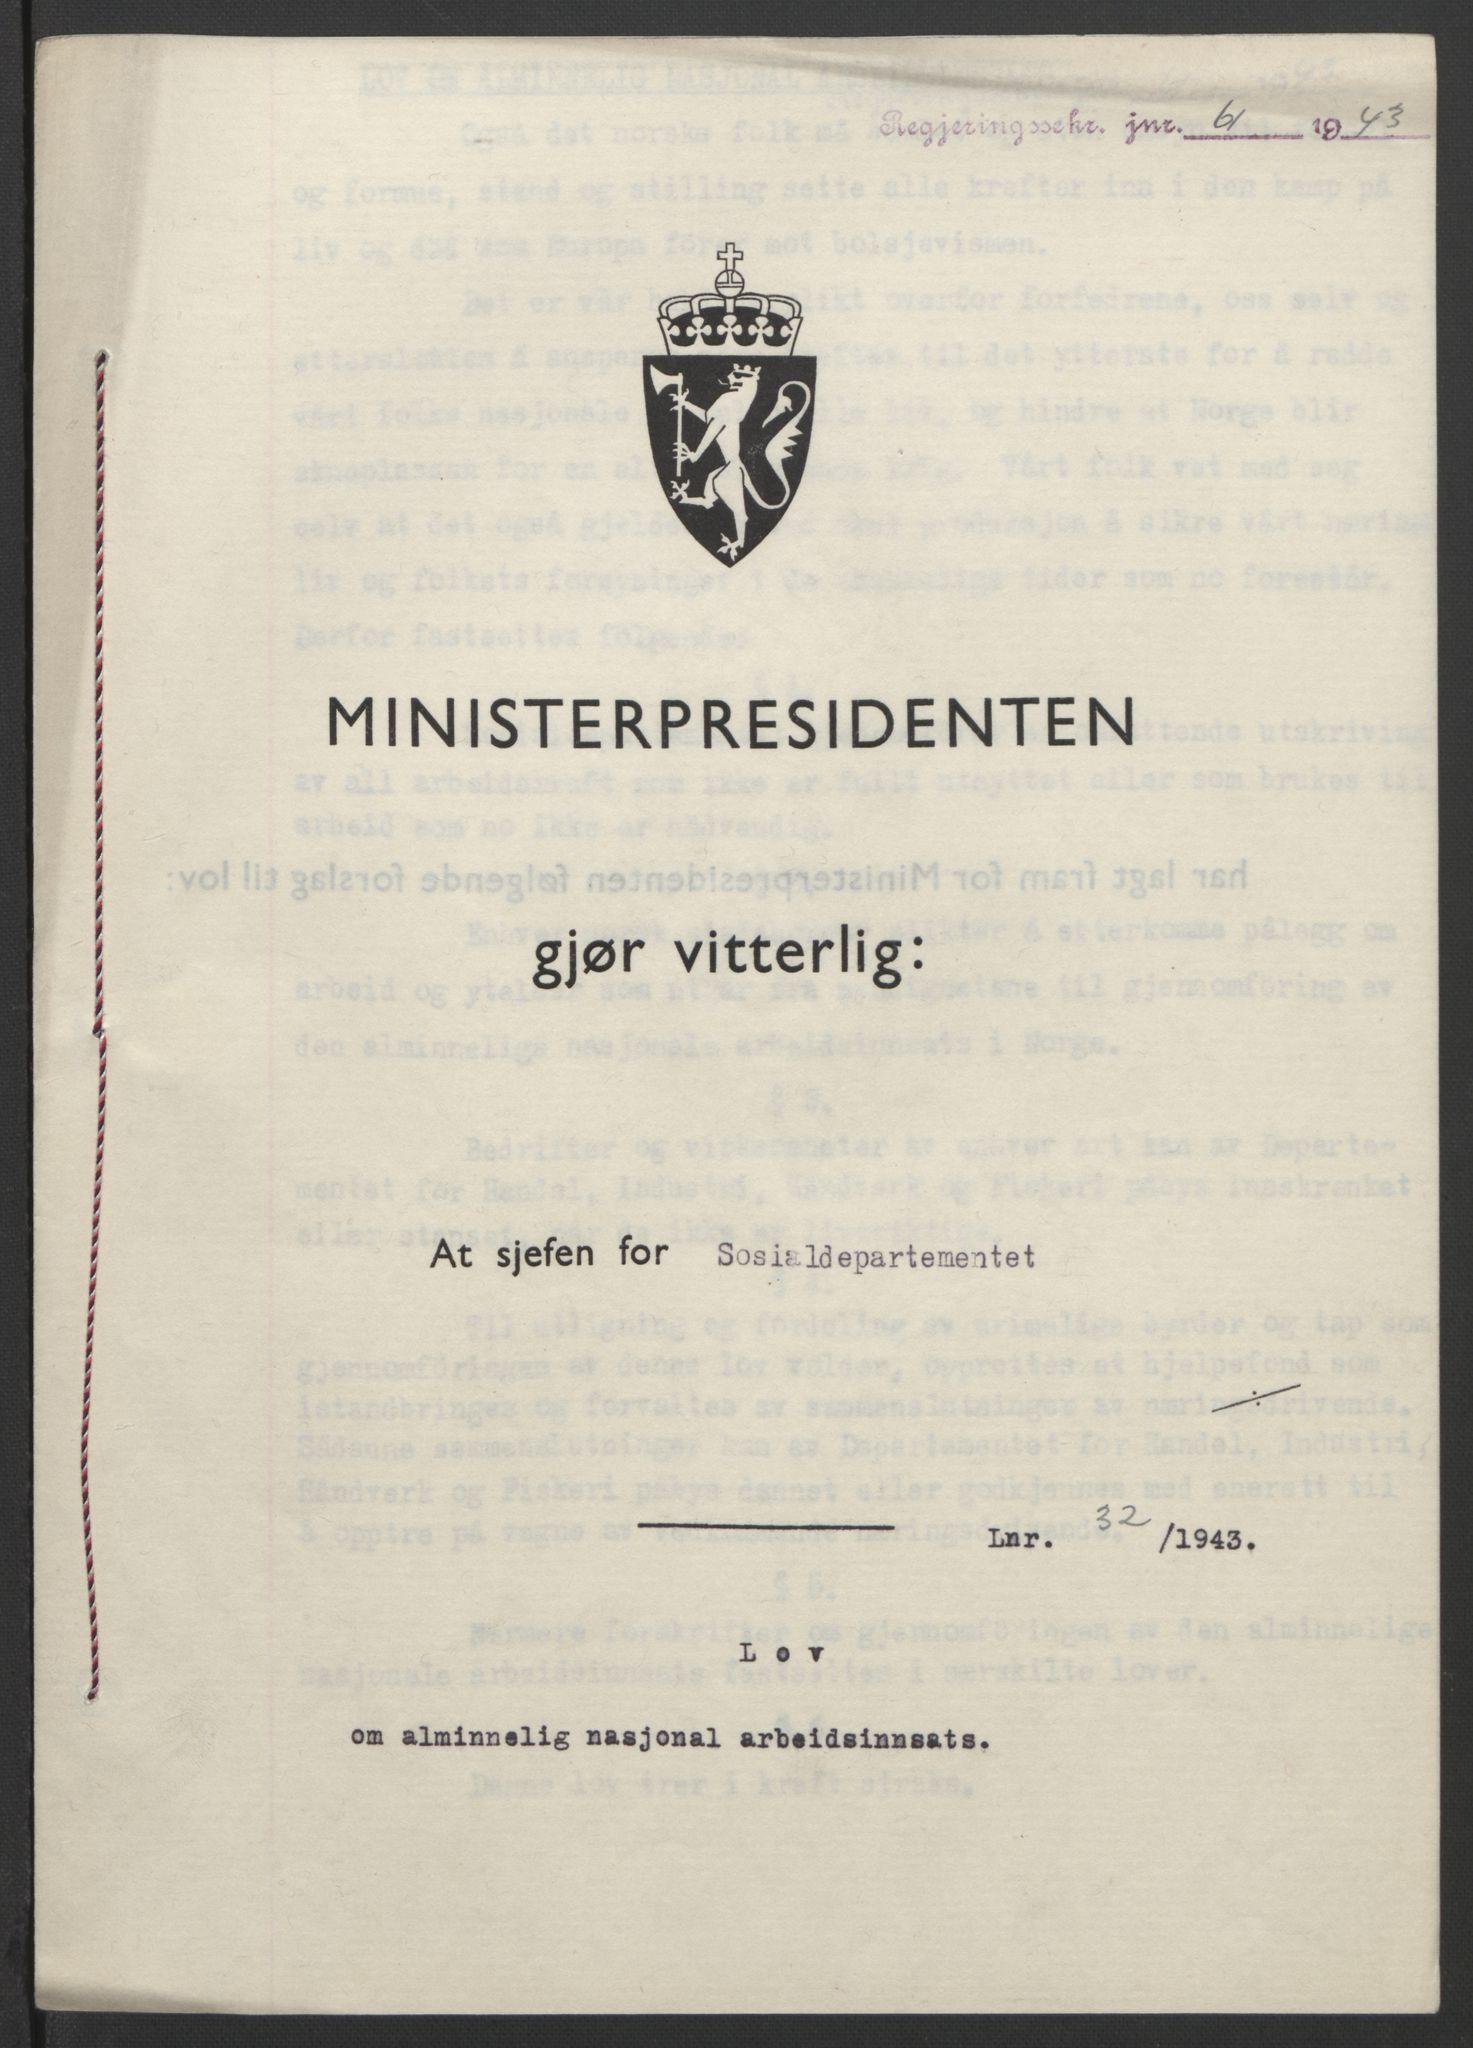 RA, NS-administrasjonen 1940-1945 (Statsrådsekretariatet, de kommisariske statsråder mm), D/Db/L0099: Lover, 1943, s. 132